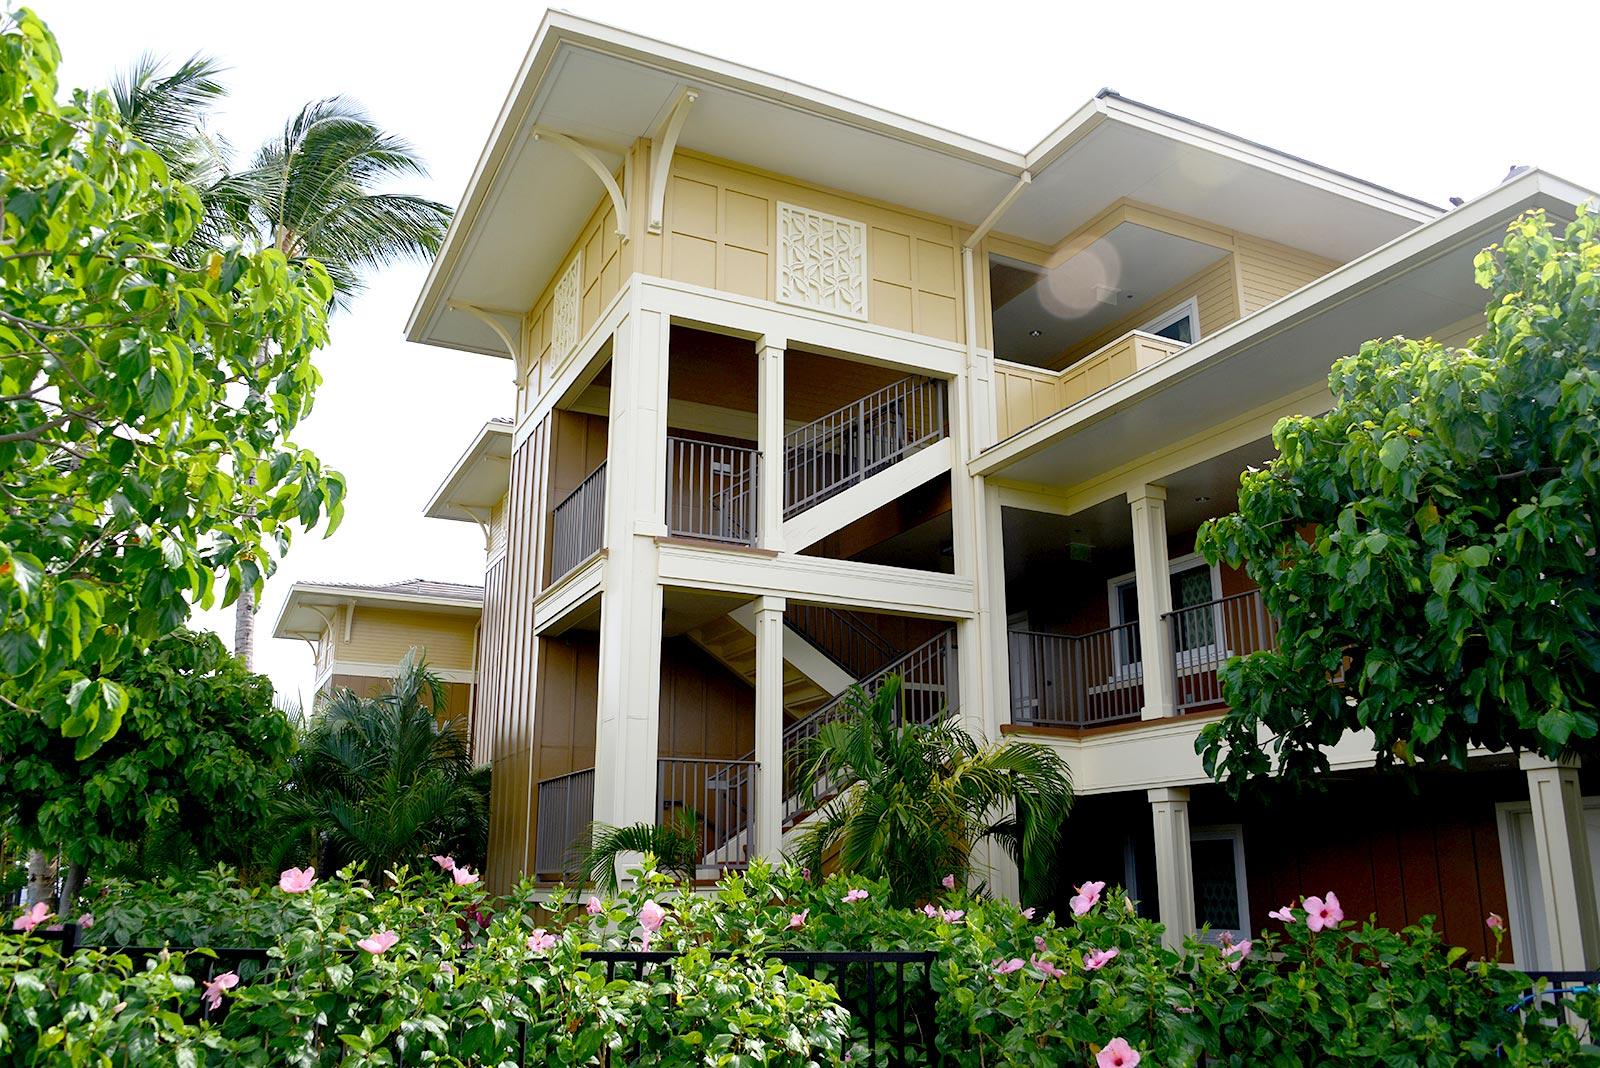 Hilton Kings Land Waikaloa timeshare resales